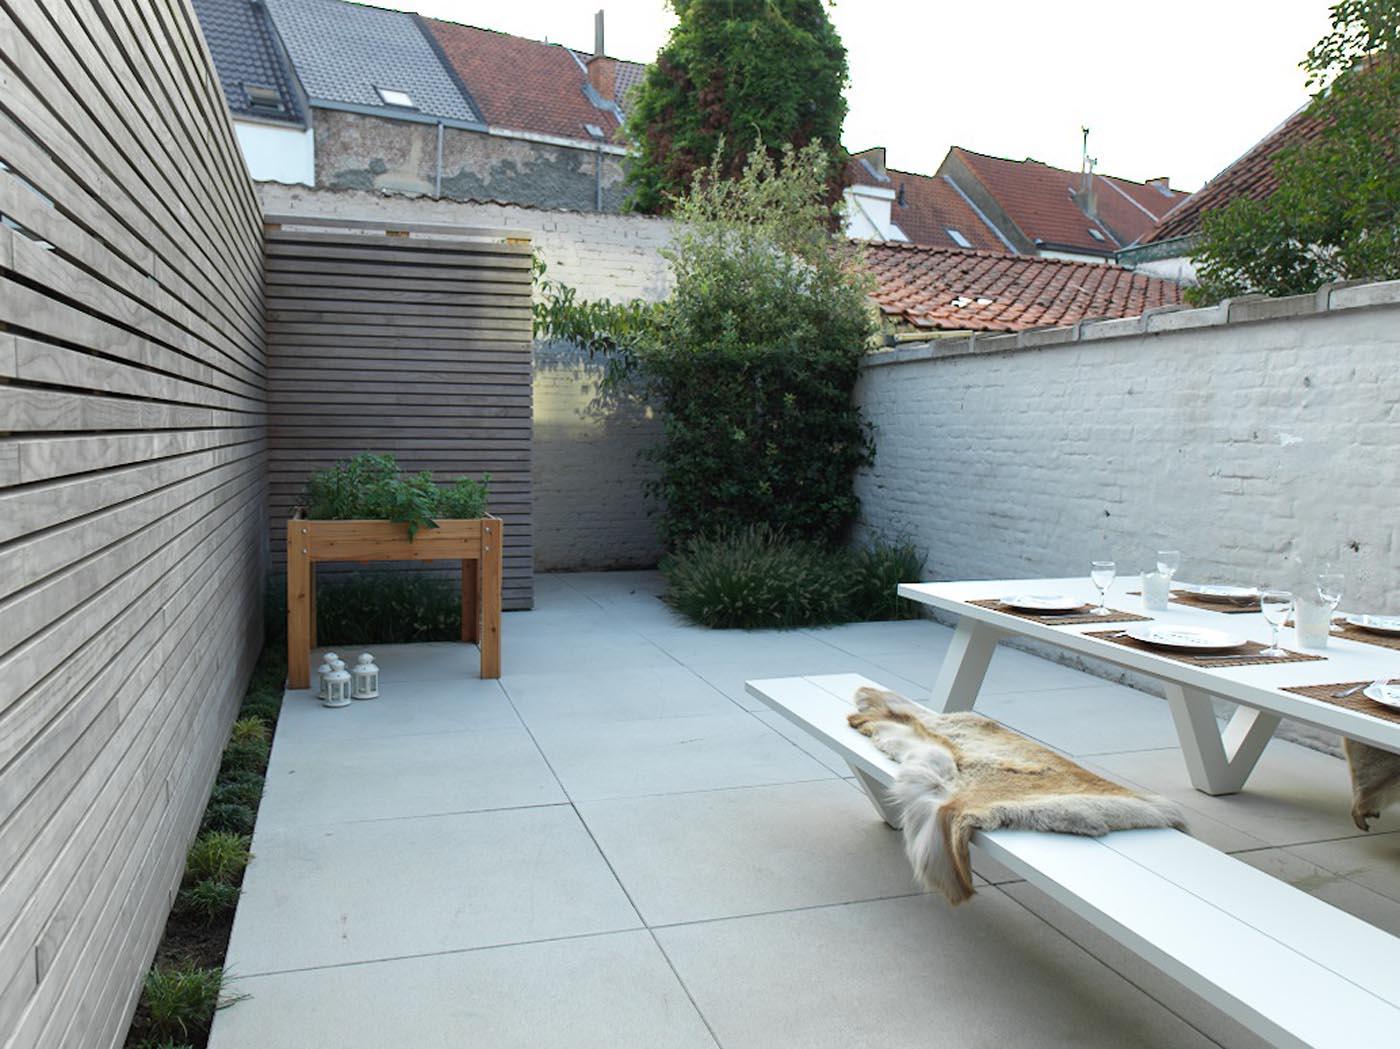 Stadstuin aanleggen l stadstuinen l tuinarchitect de roose for Tuinarchitect modern